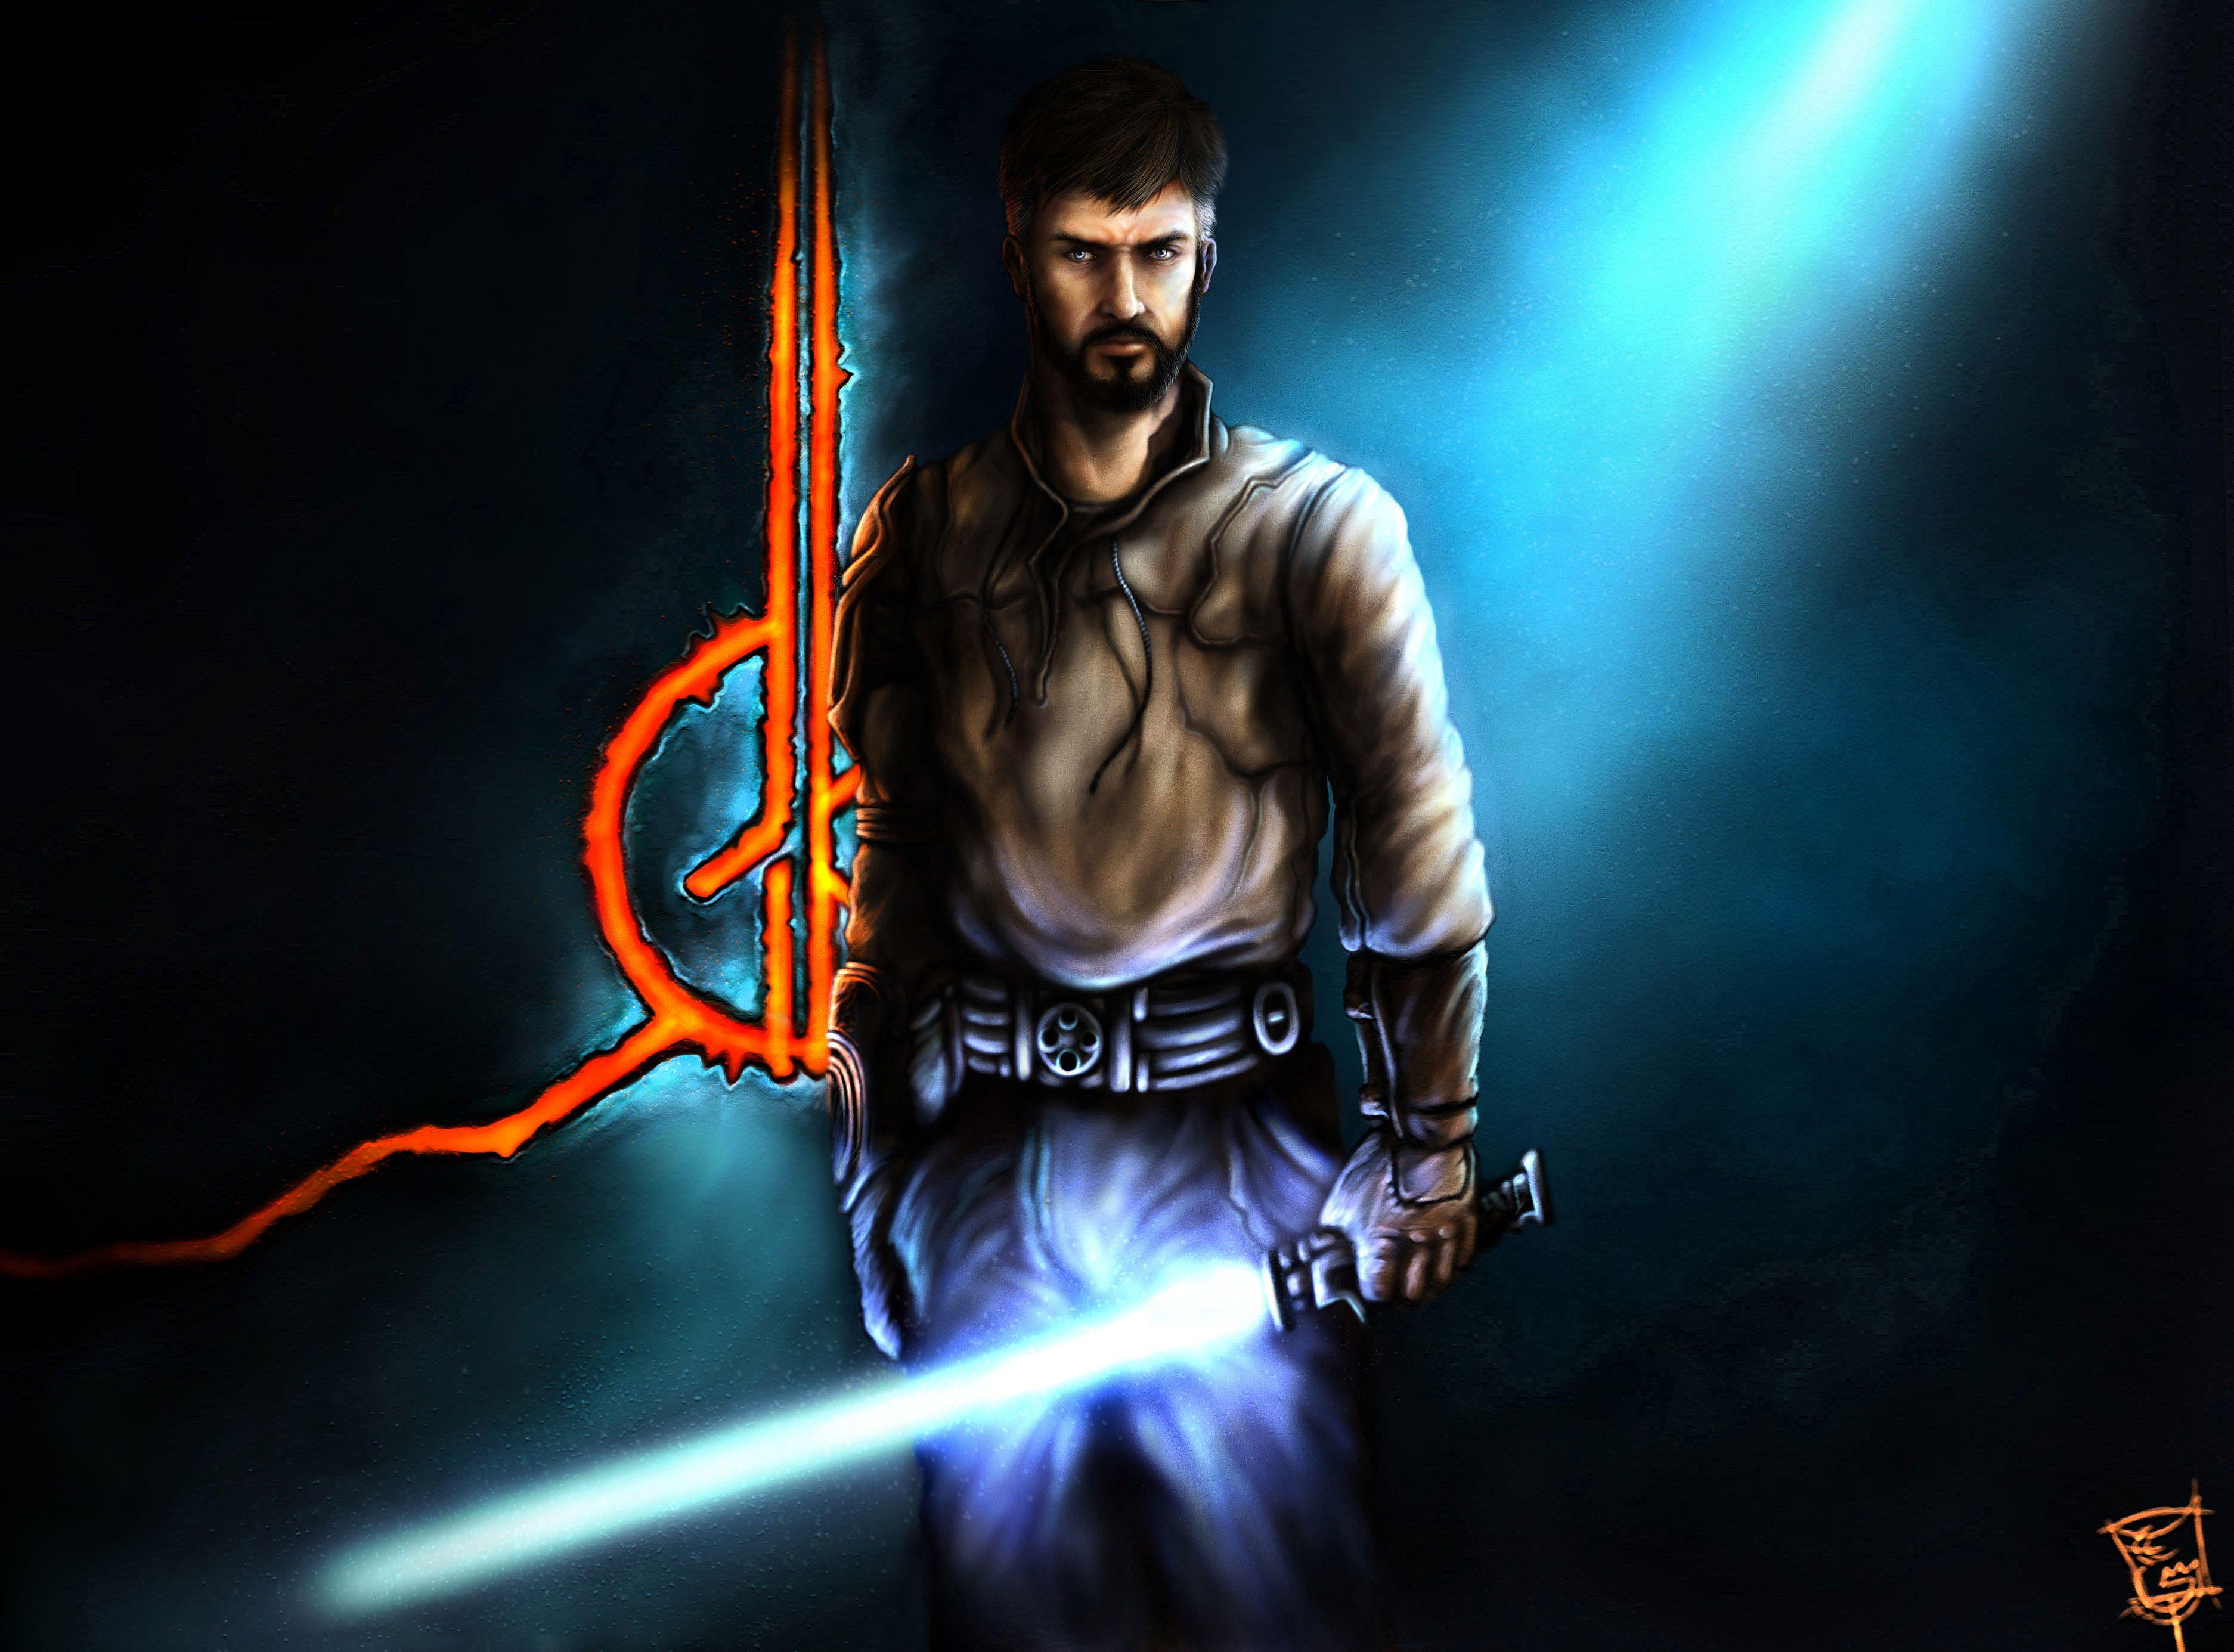 Jedi Knight Kyle Katarn By Thegameworld Deviantart Com On